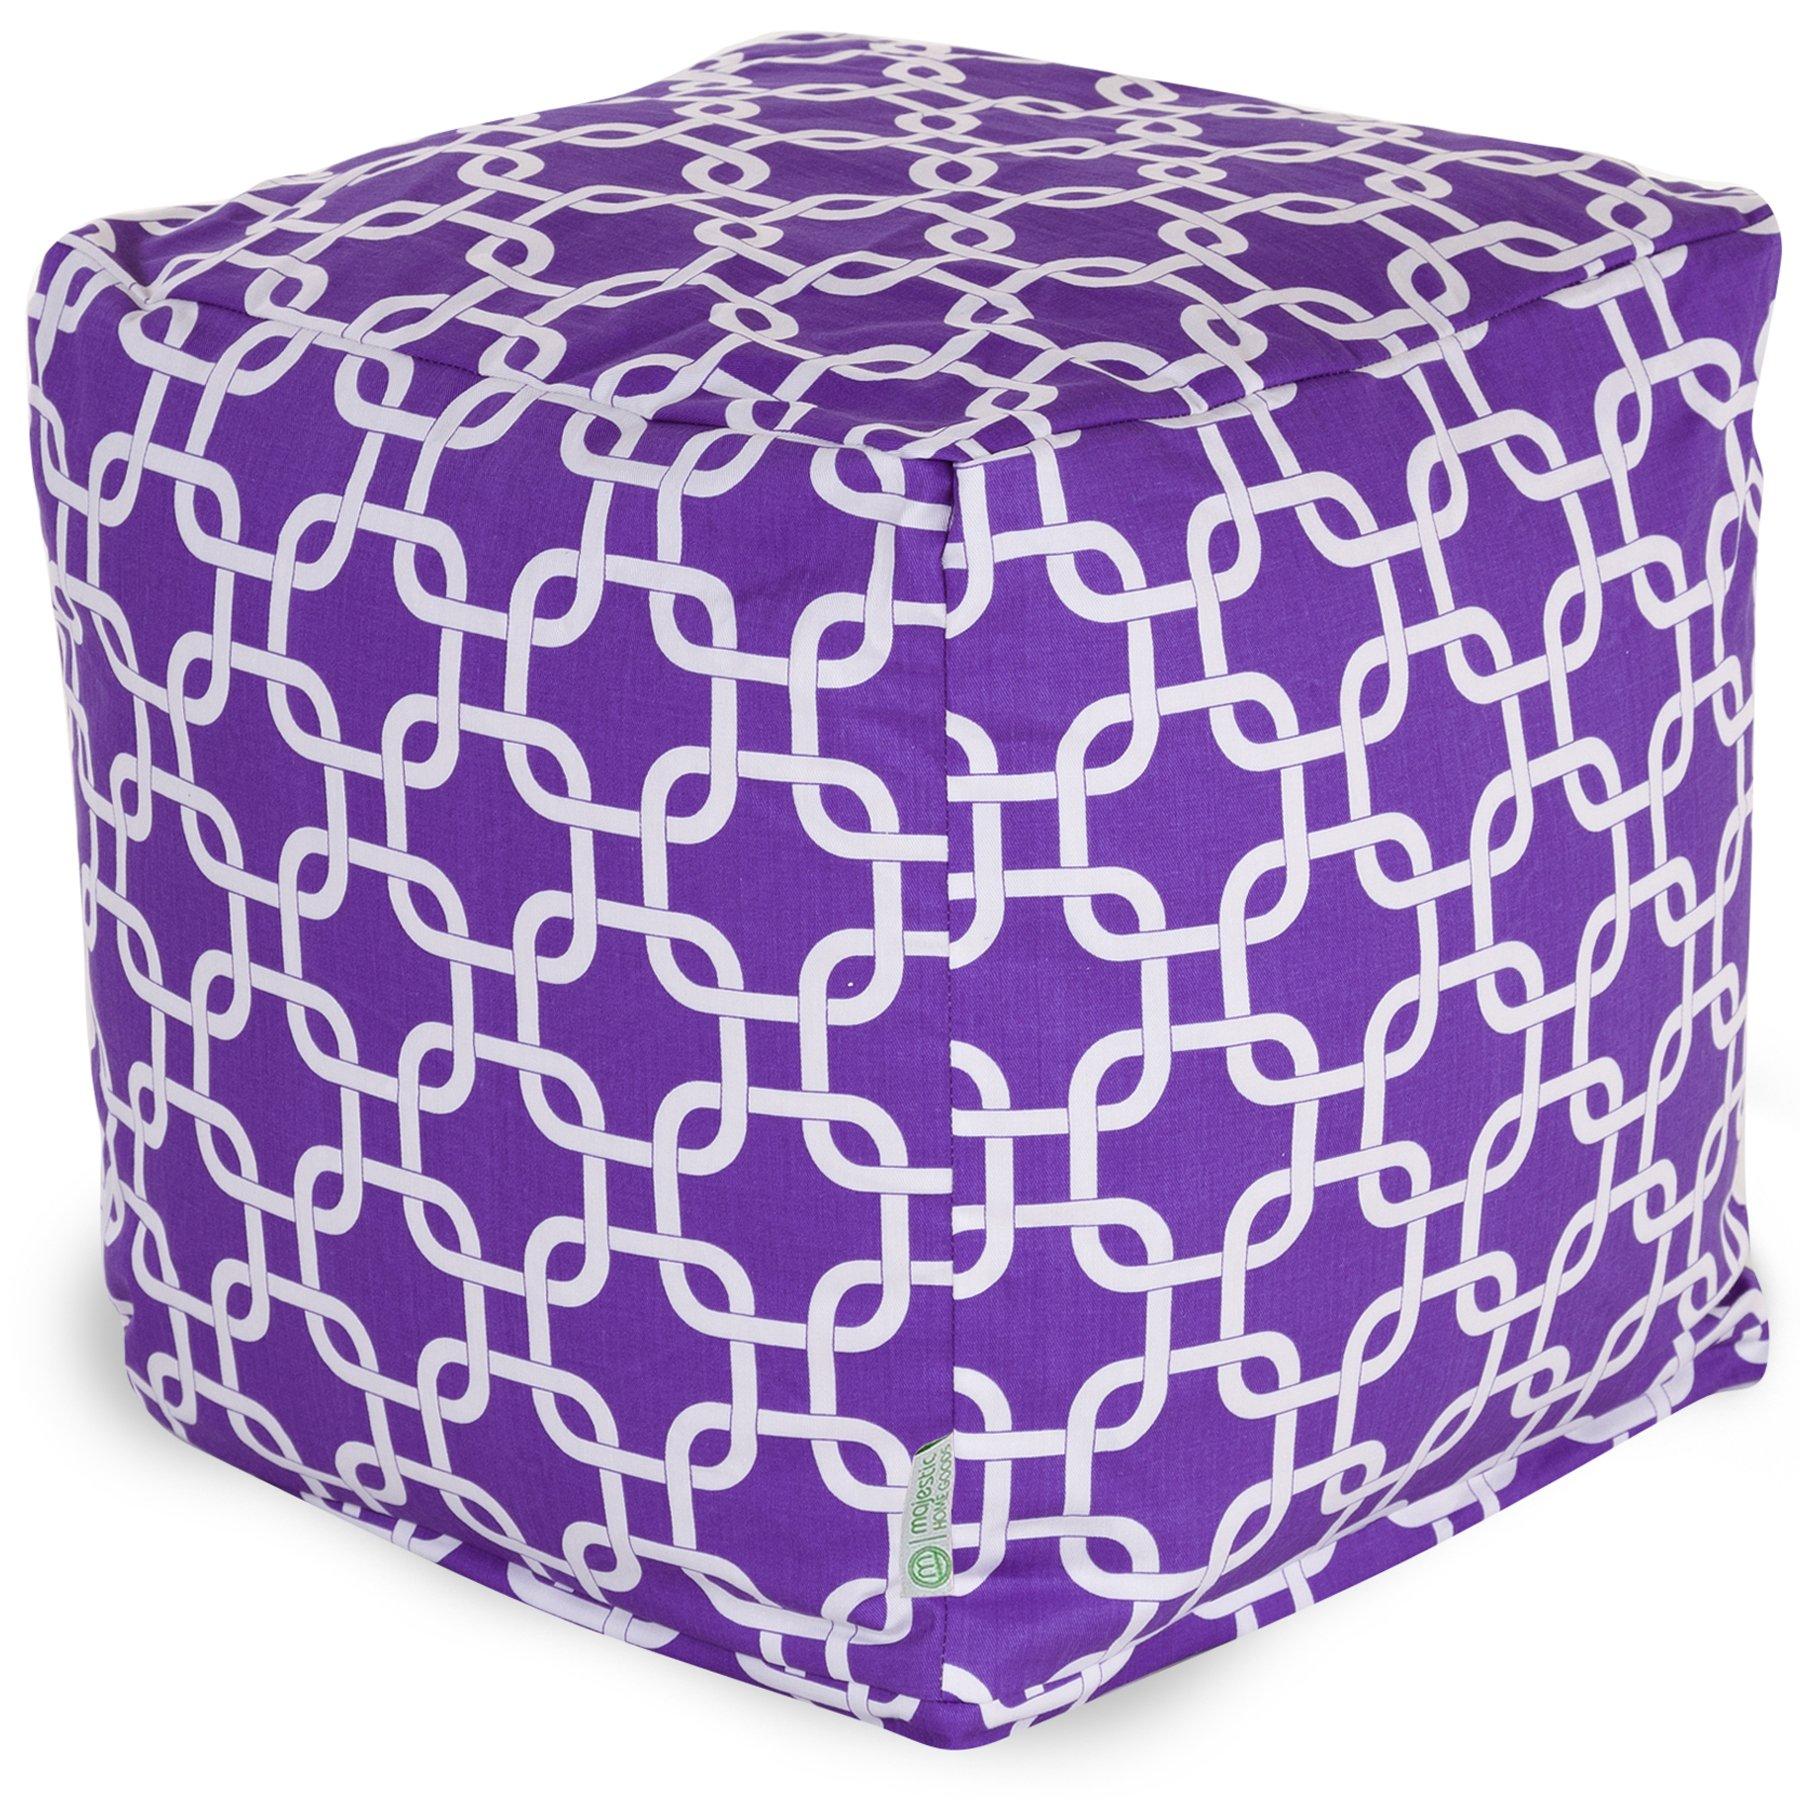 Majestic Home Goods Links Indoor/Outdoor Bean Bag Ottoman Pouf Cube, 17'' x 17'' x 17'' (Purple)